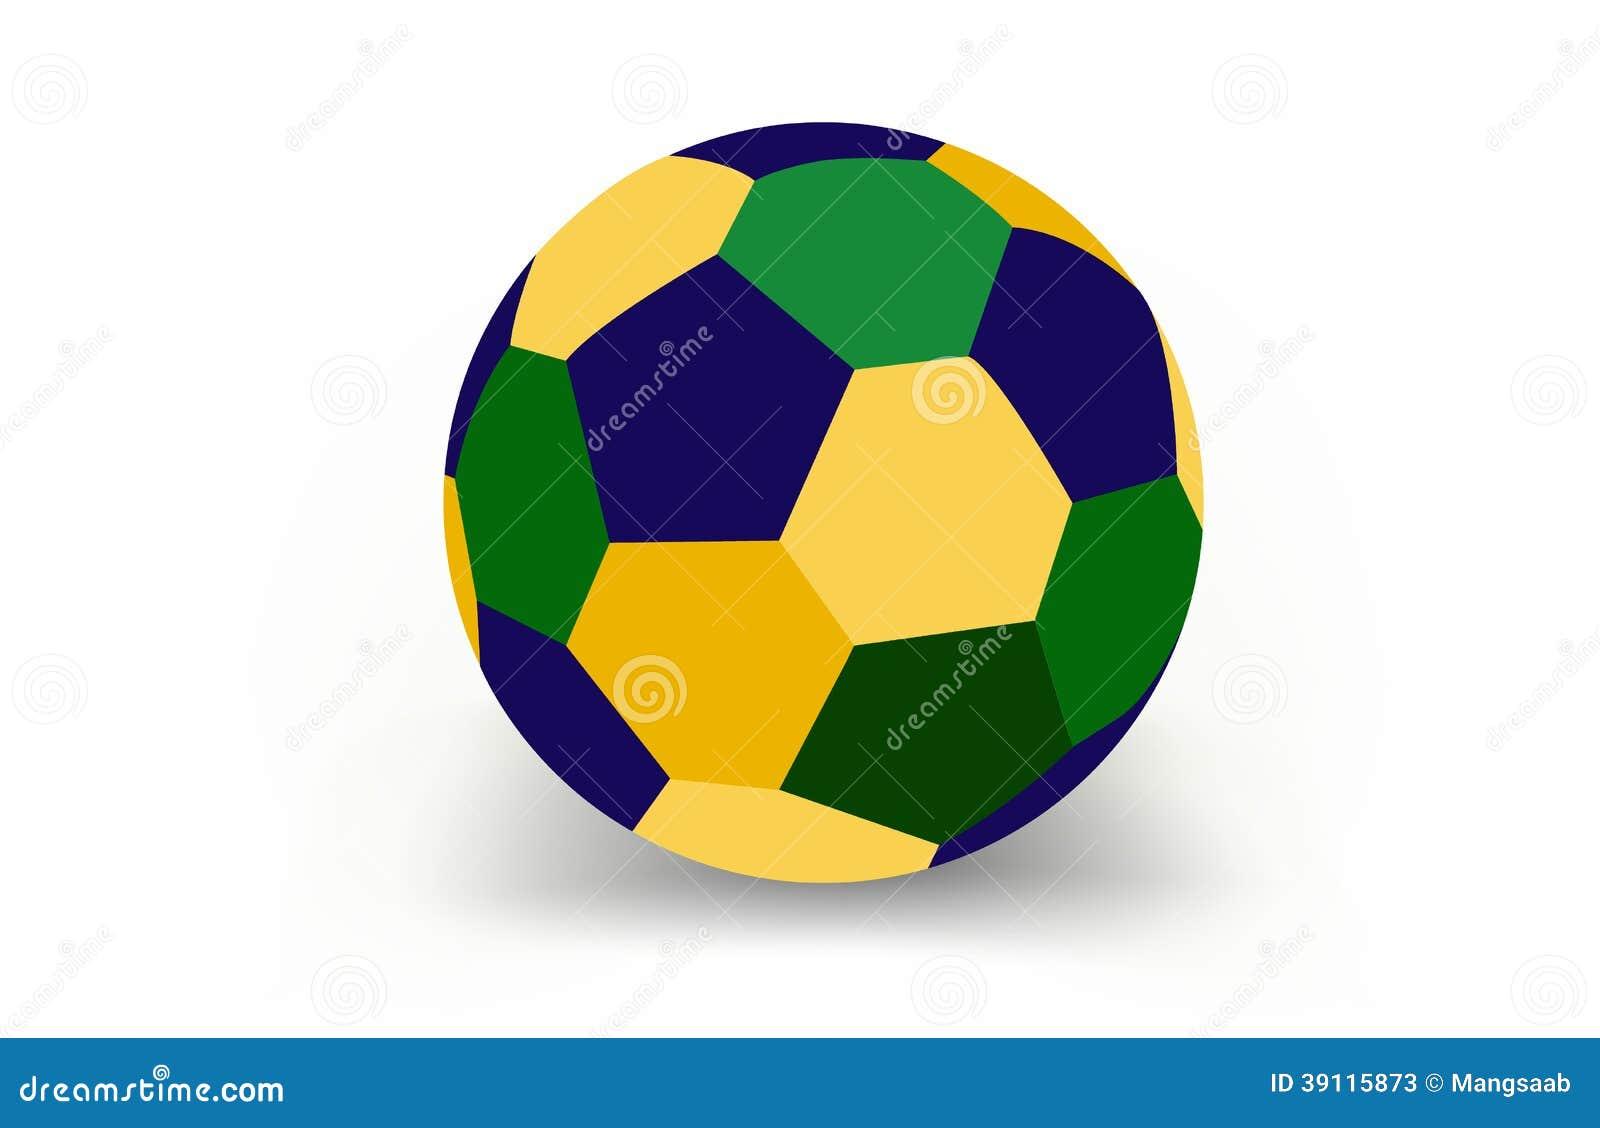 Voetbalbal van Brazilië